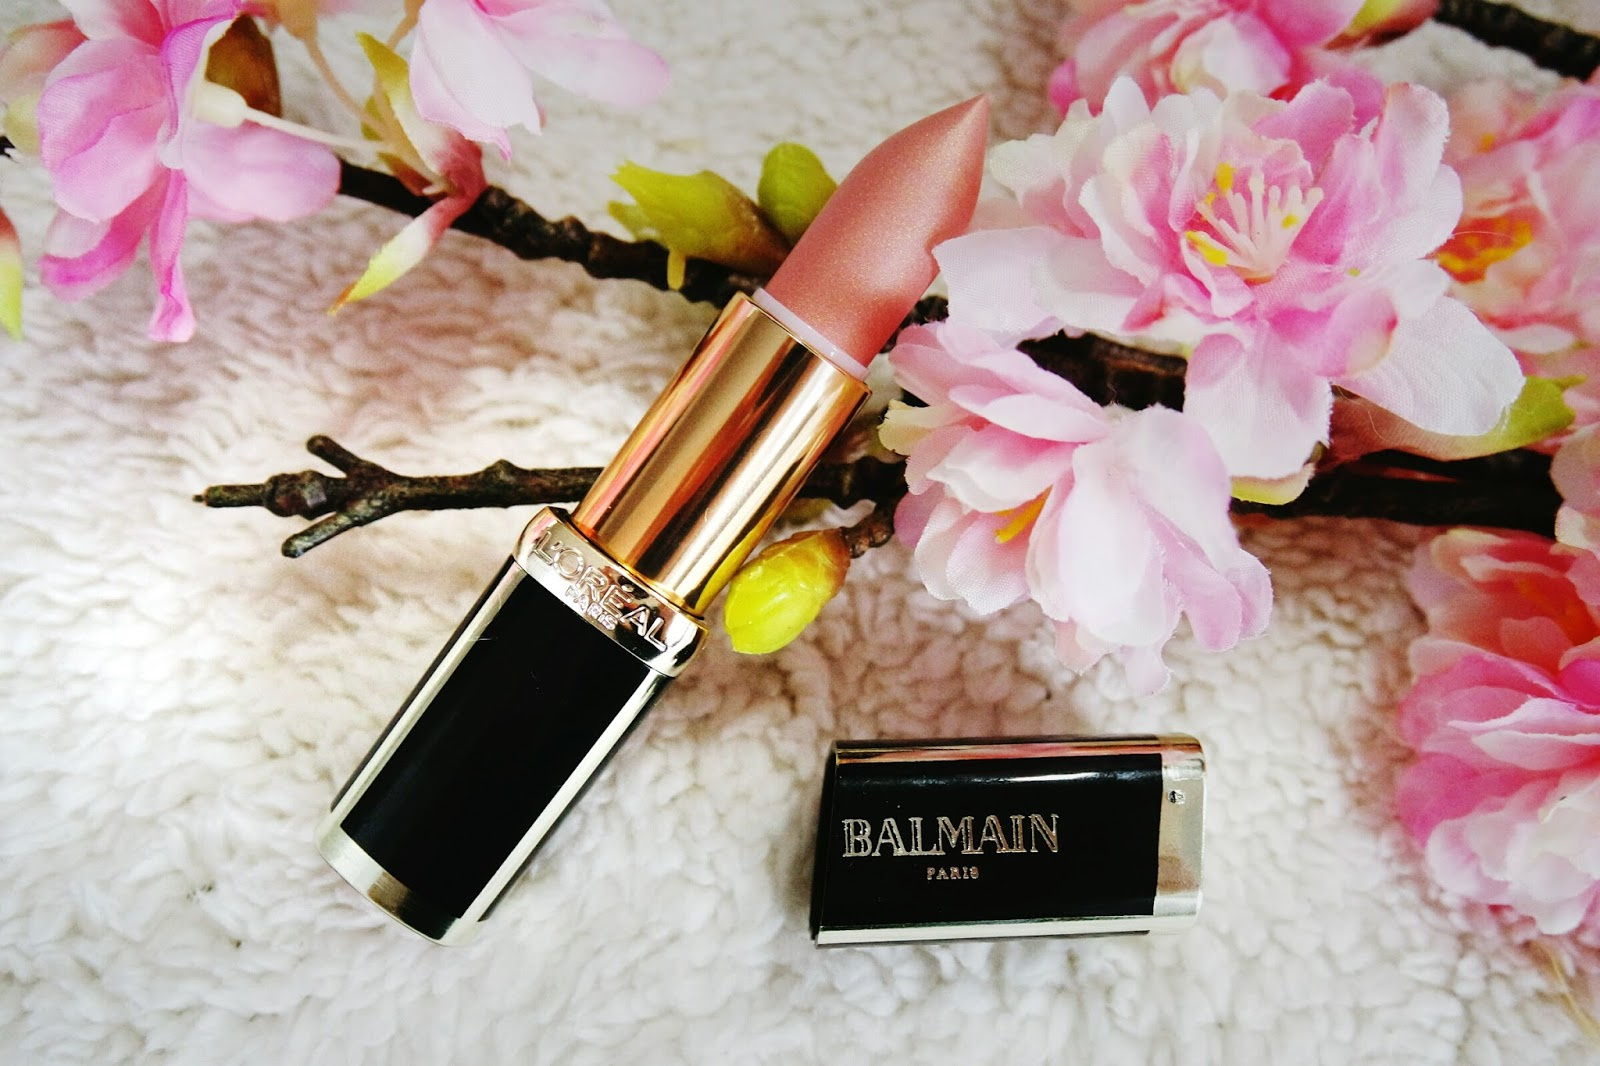 Balmain Confidence Lippenstift